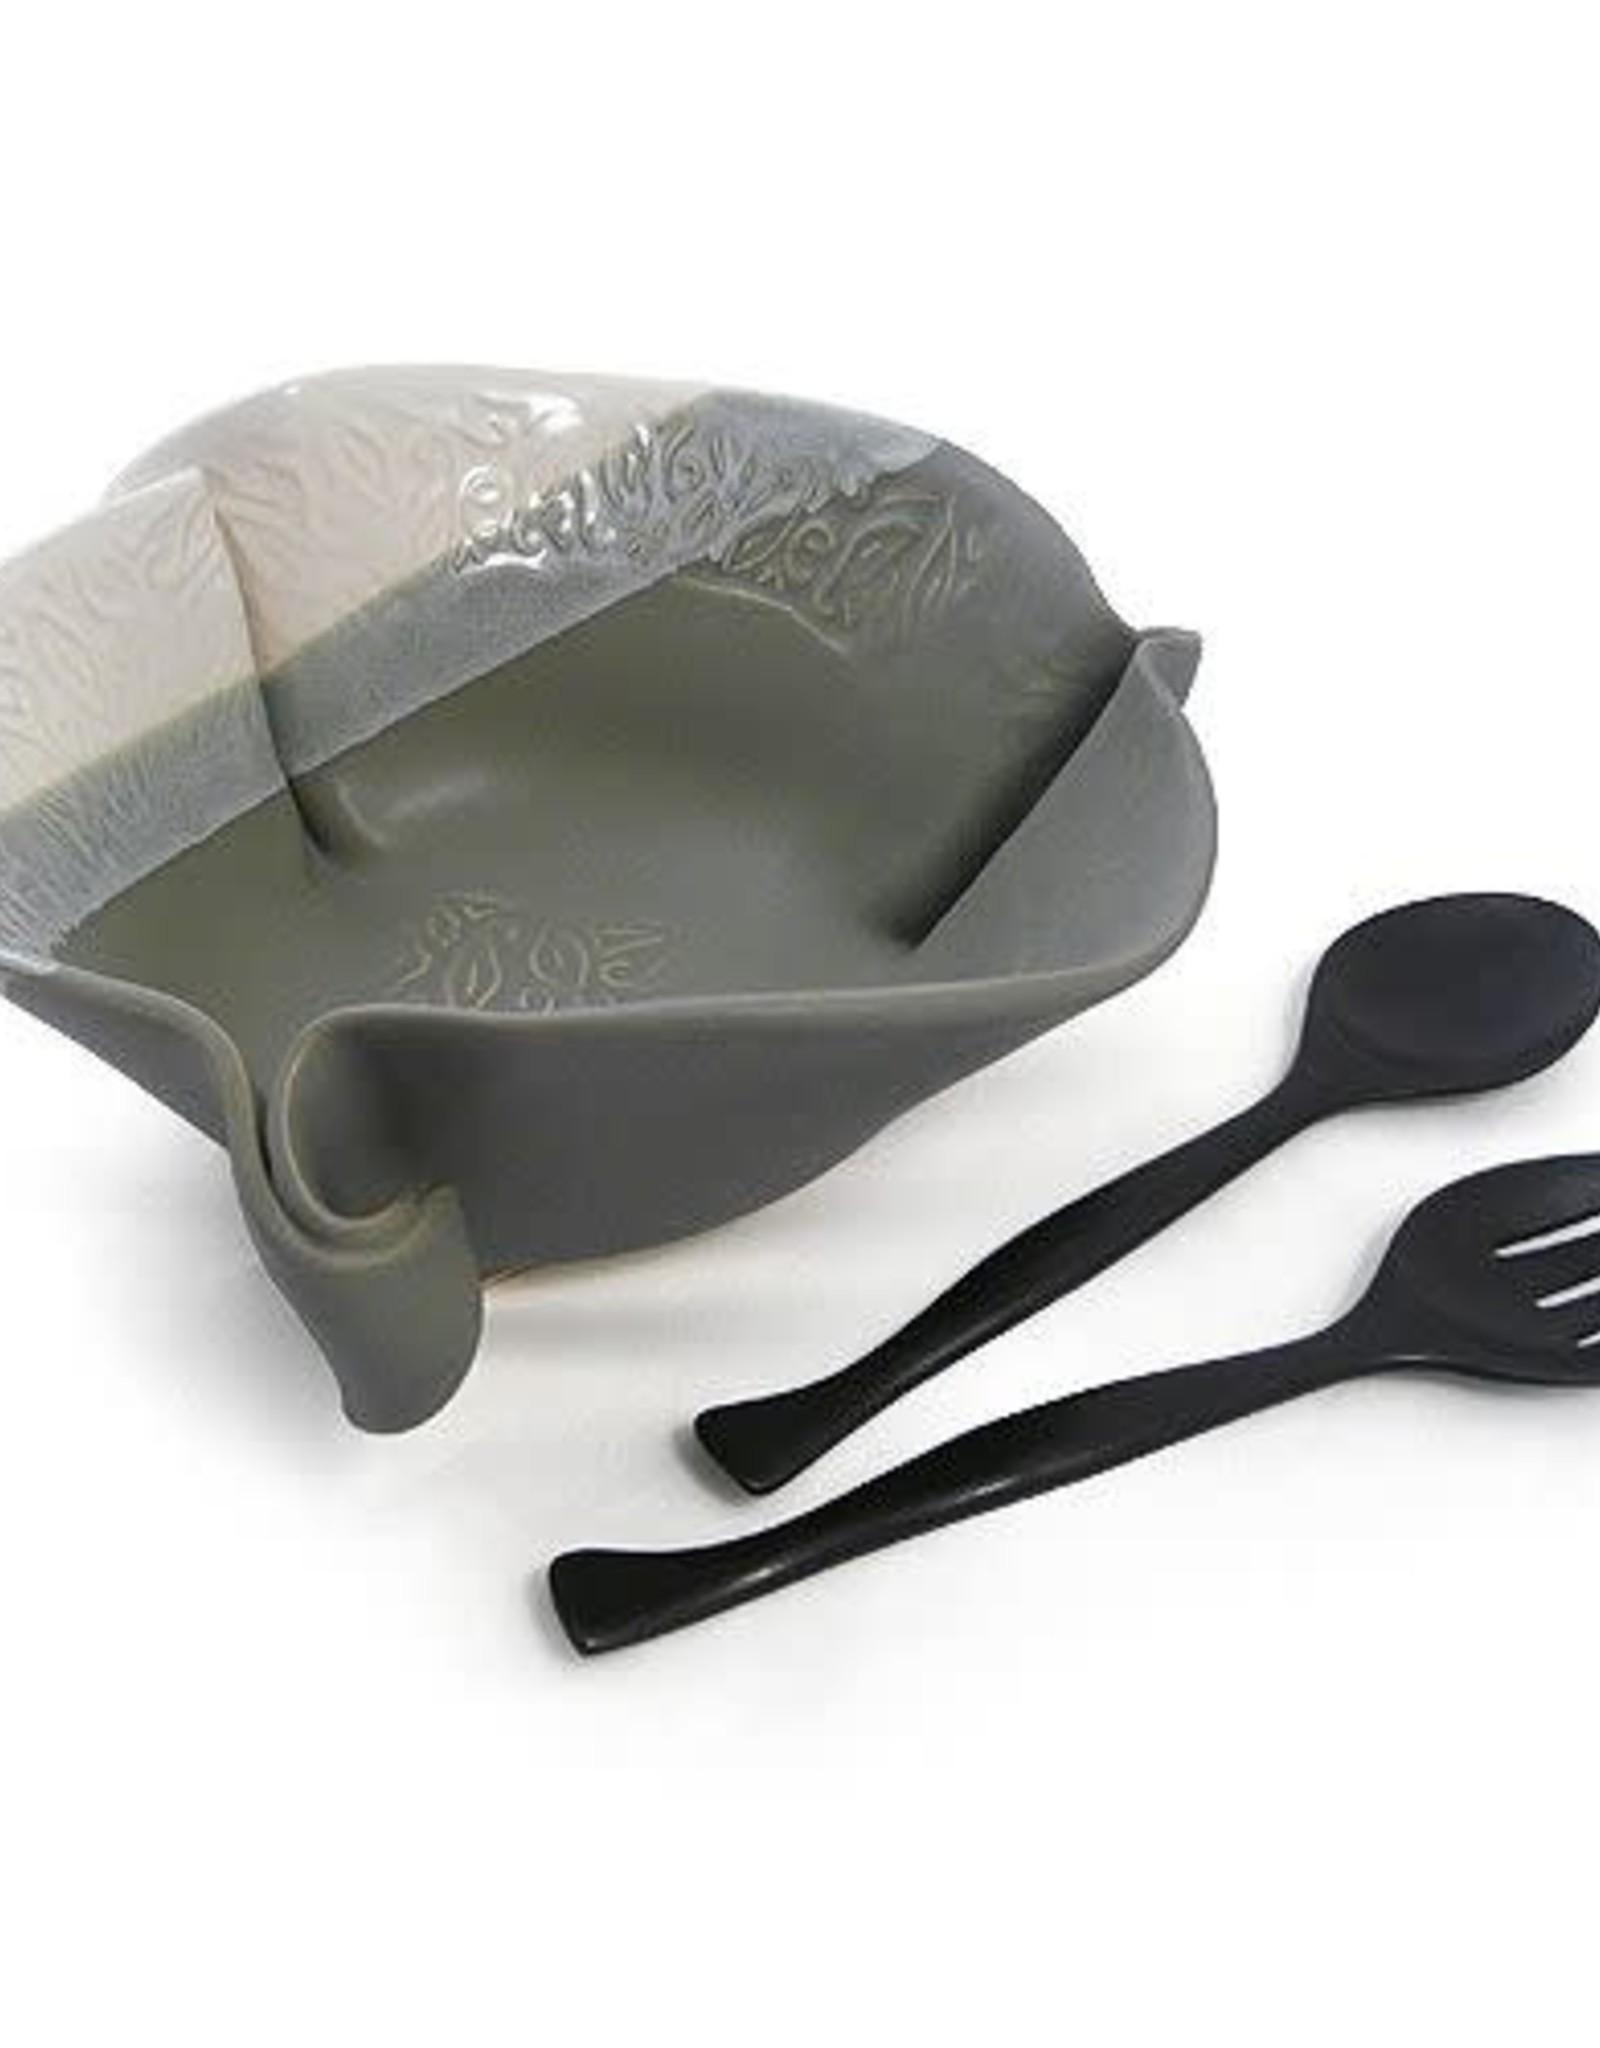 Hilborn Pottery Large Salad Bowl Pottery